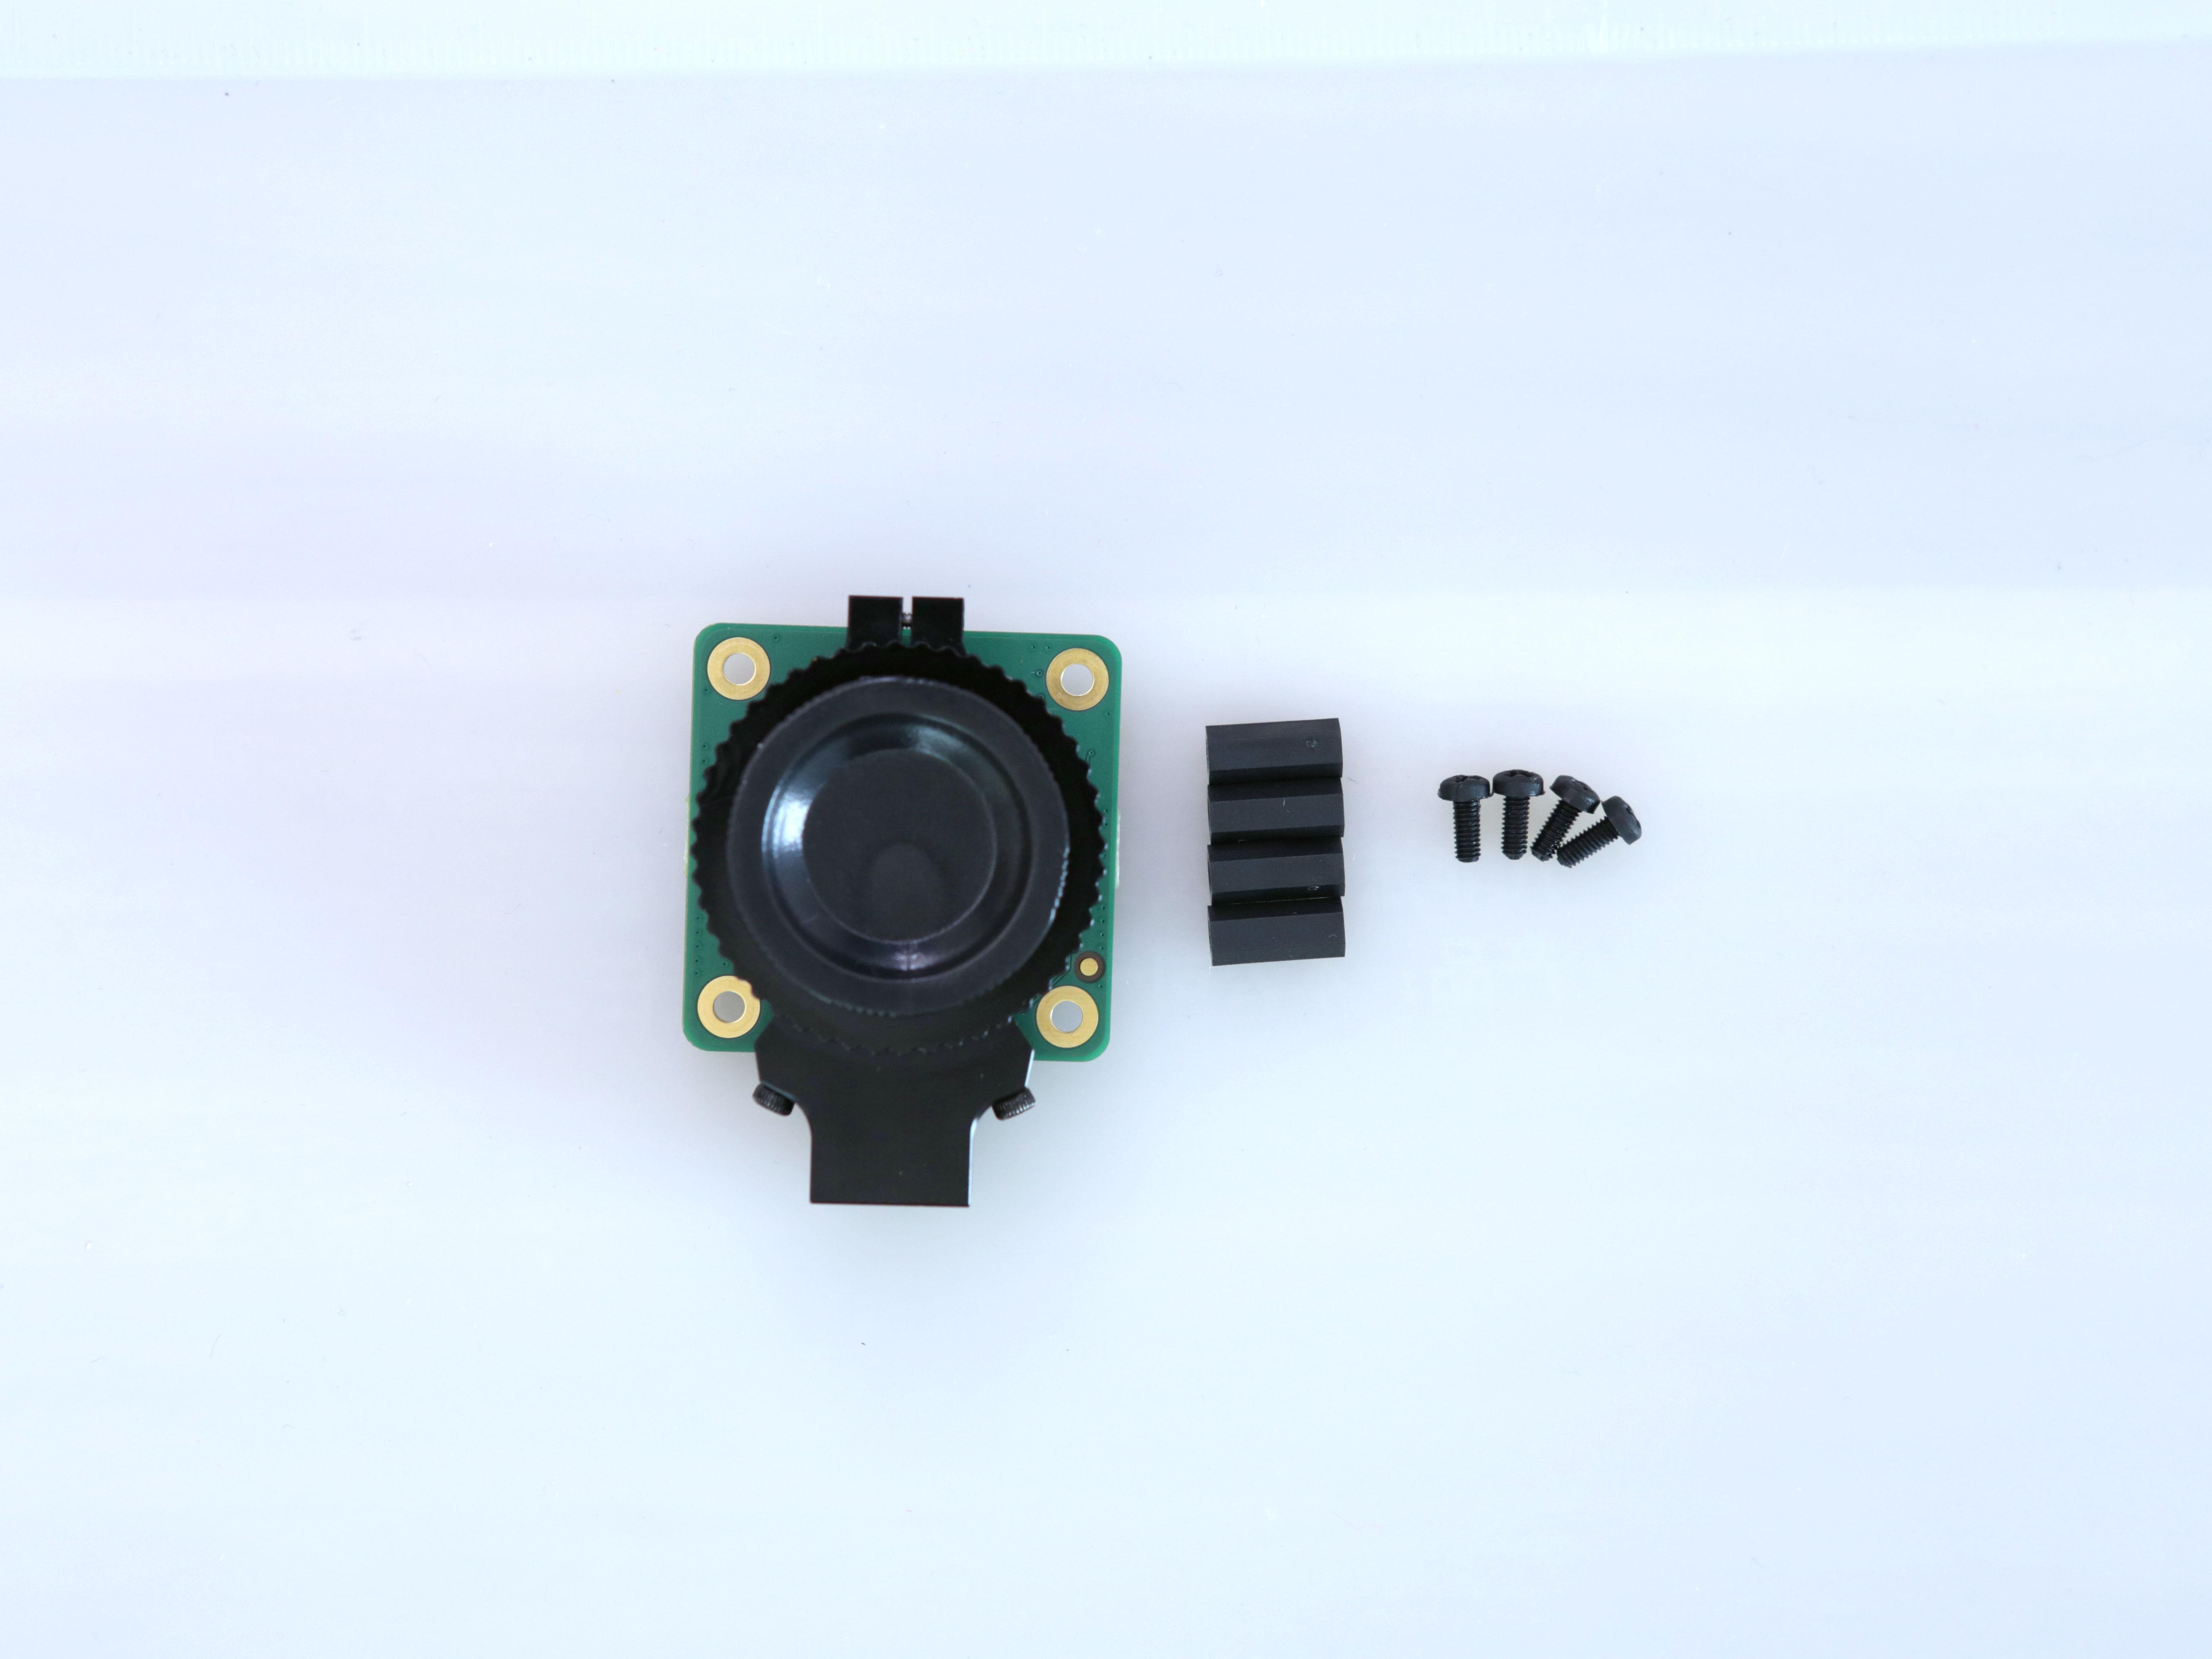 raspberry_pi_picam-hardware.jpg